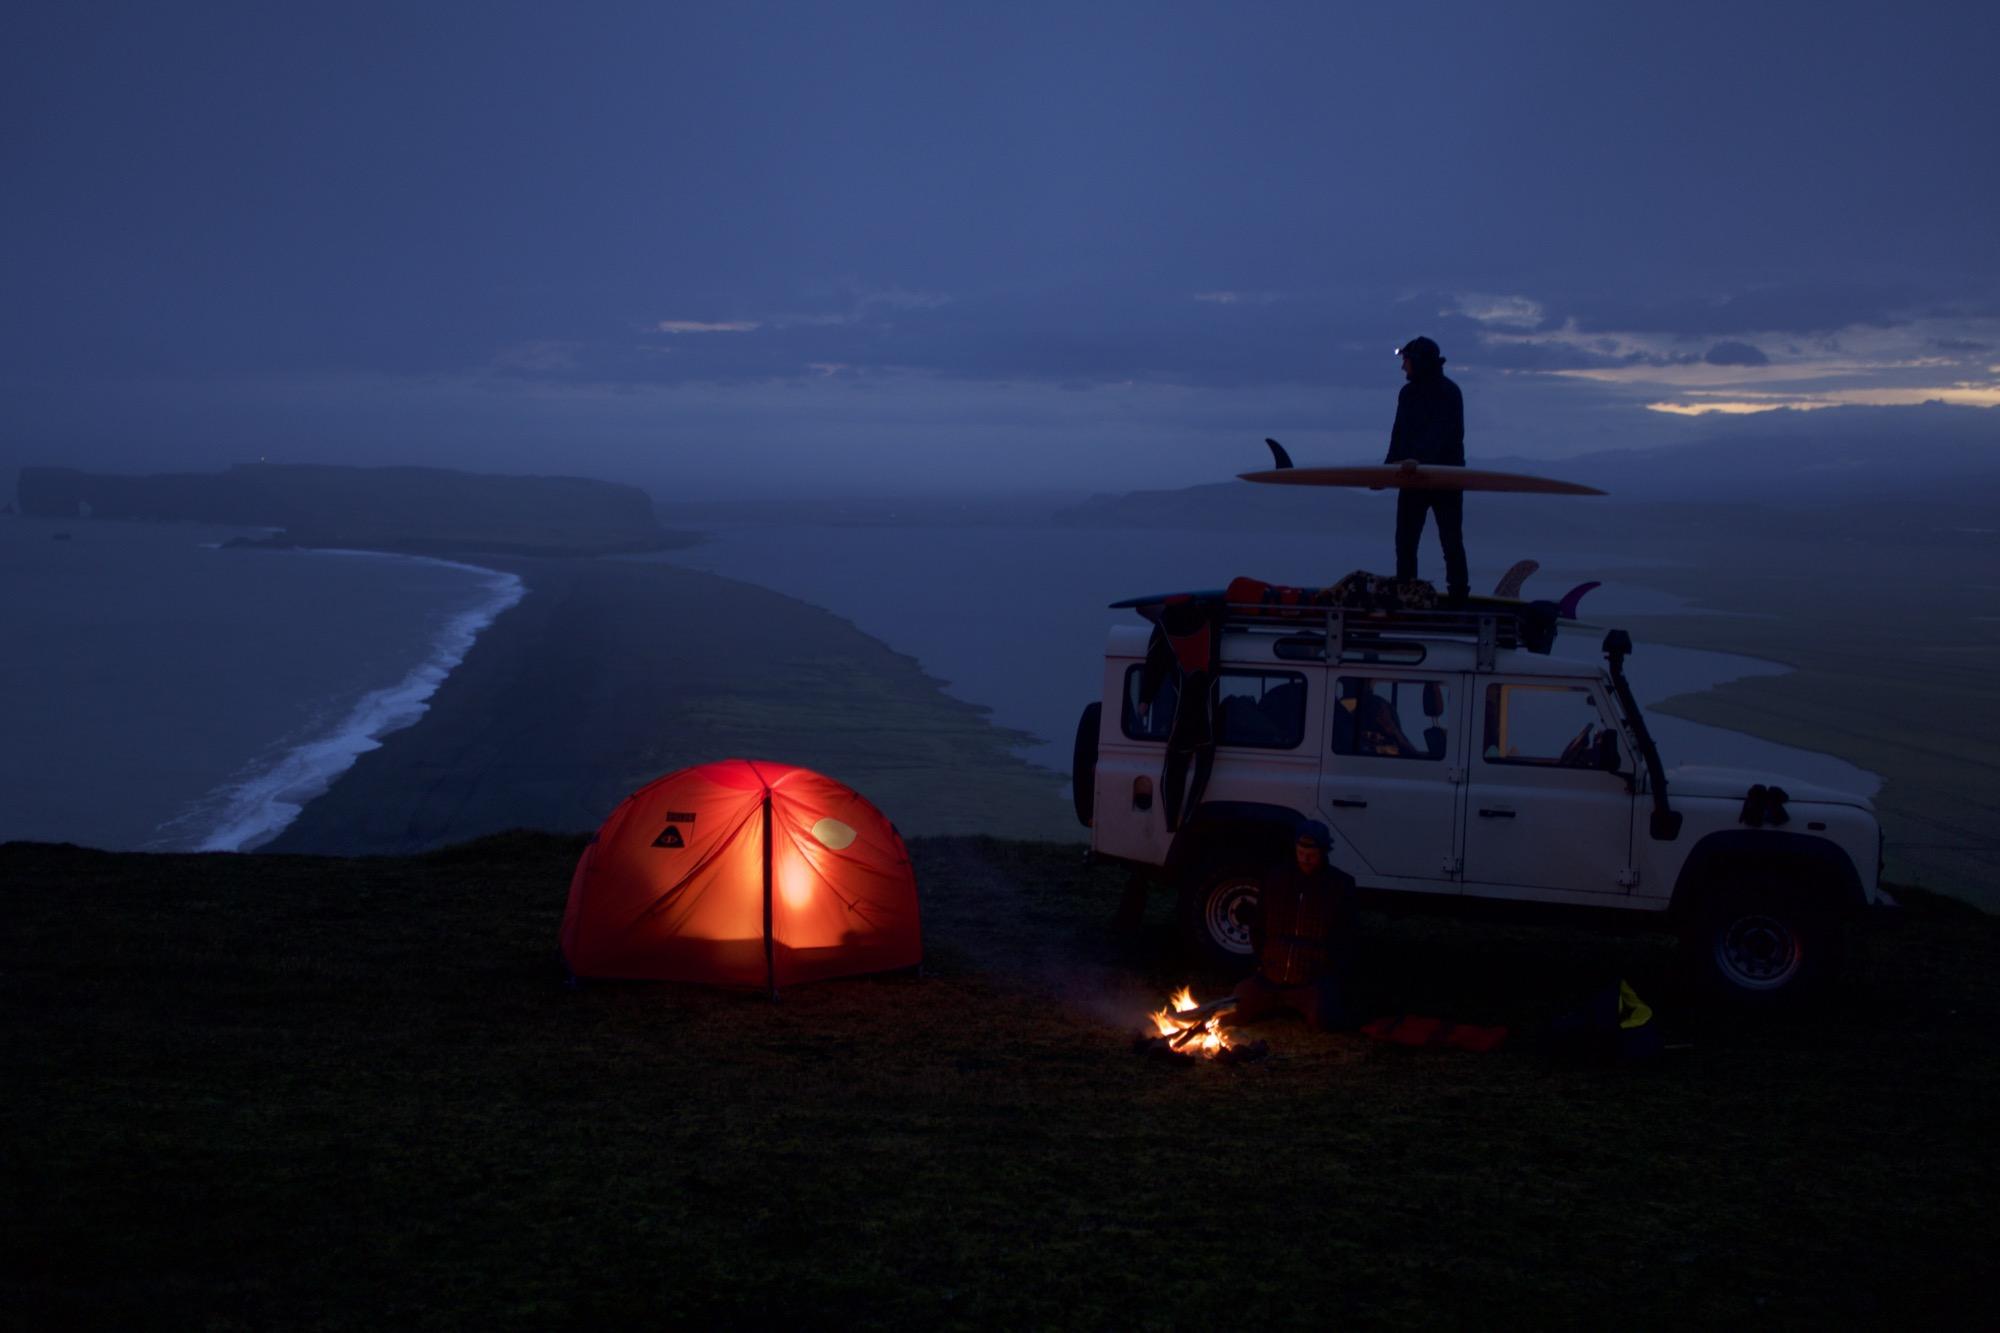 Reid Jackson and Mikey DeTemple, Dyrhólaey, Iceland<br /> Water temp: 48° F / 9° C<br /> Air temp: 52° F / 11° C<br /> Photo by Chris Burkard